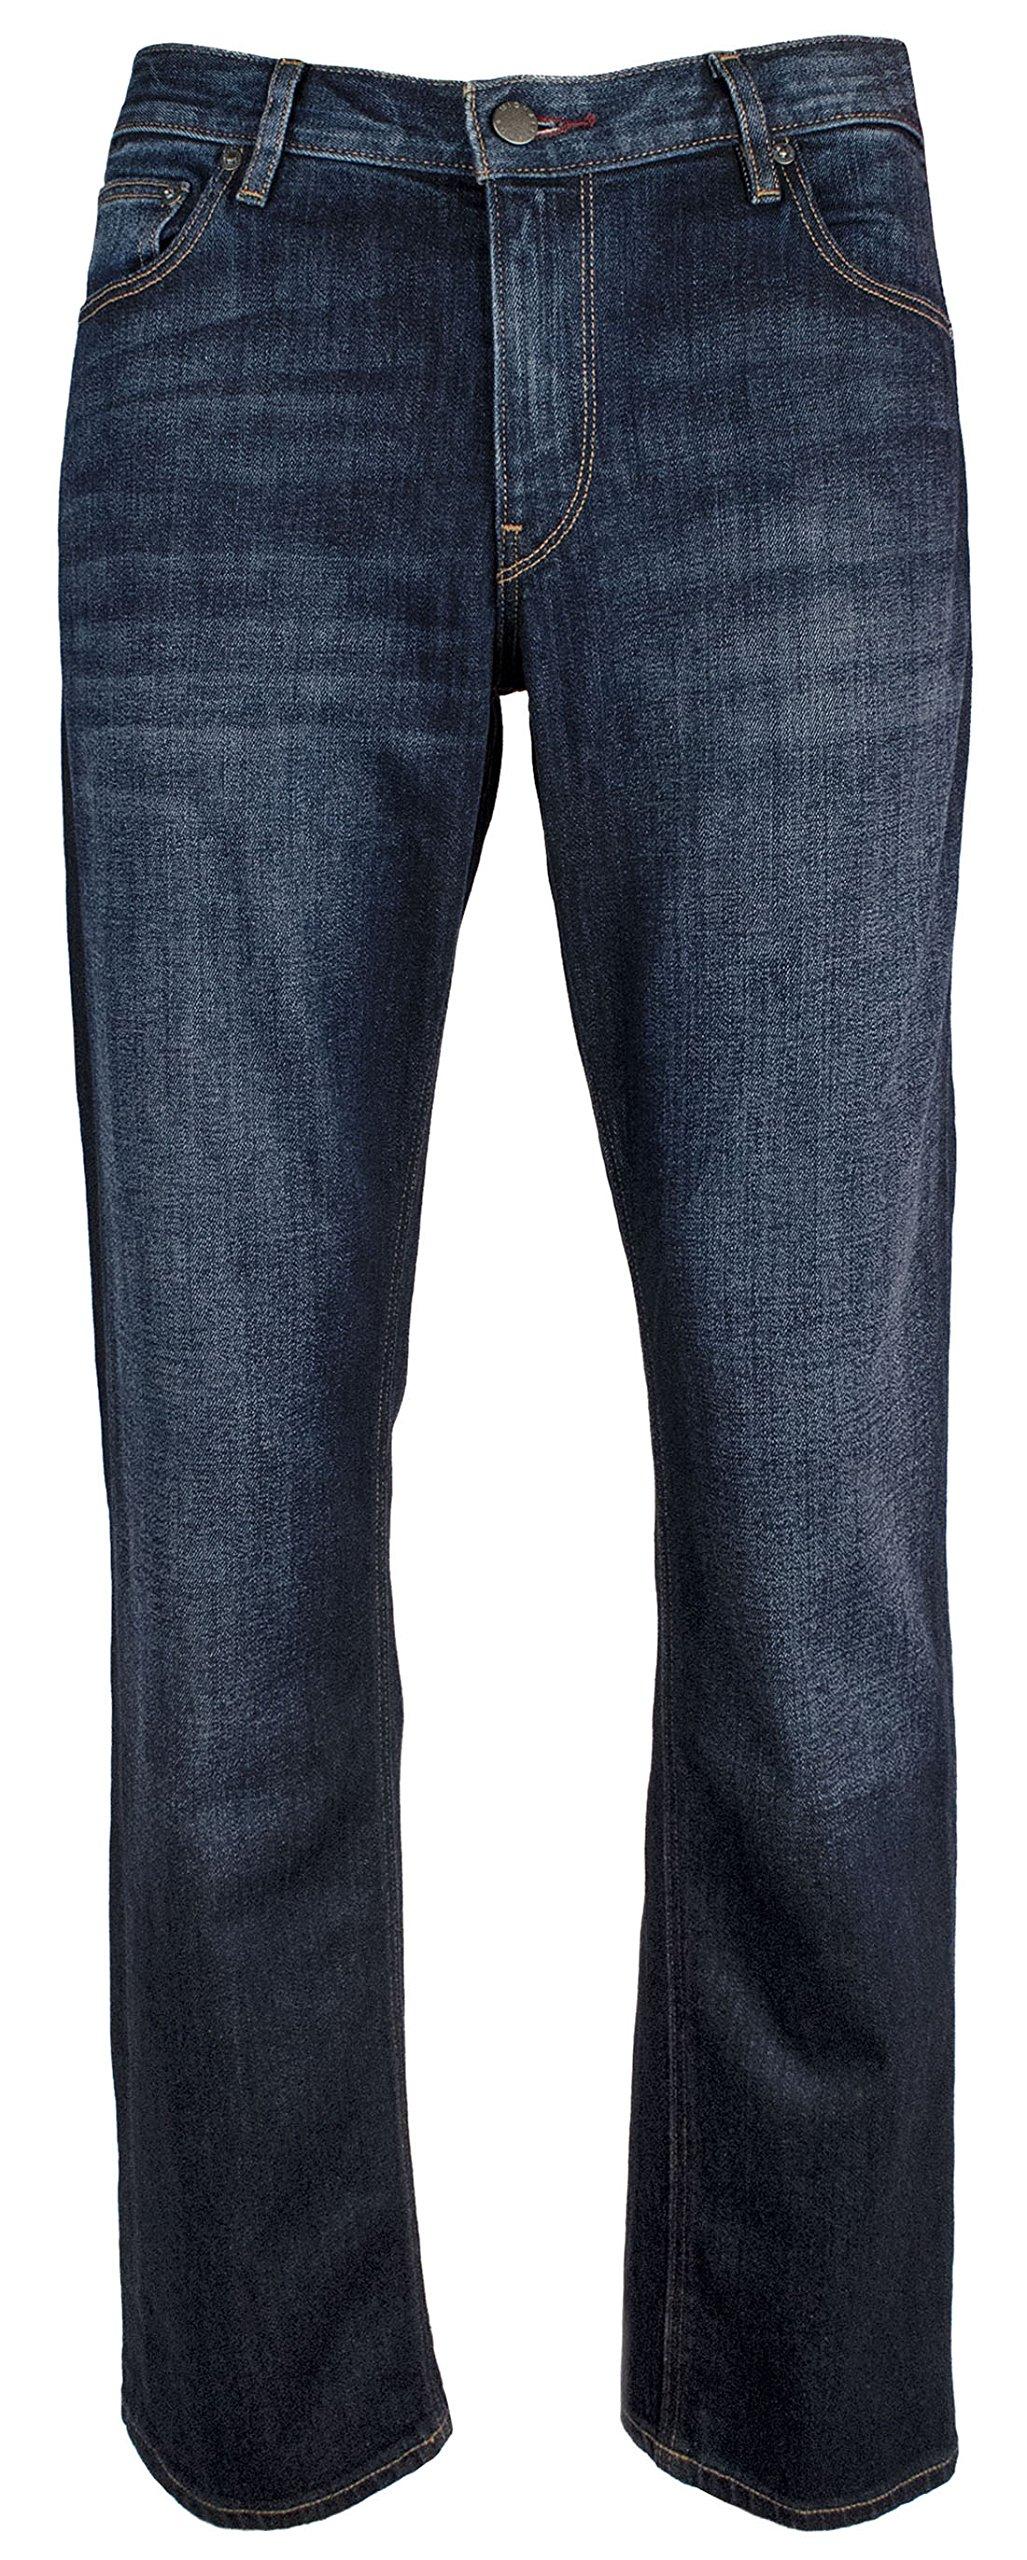 Michael Kors Men's Tailored Fit Indigo Jeans Pants-HI-32Wx32L